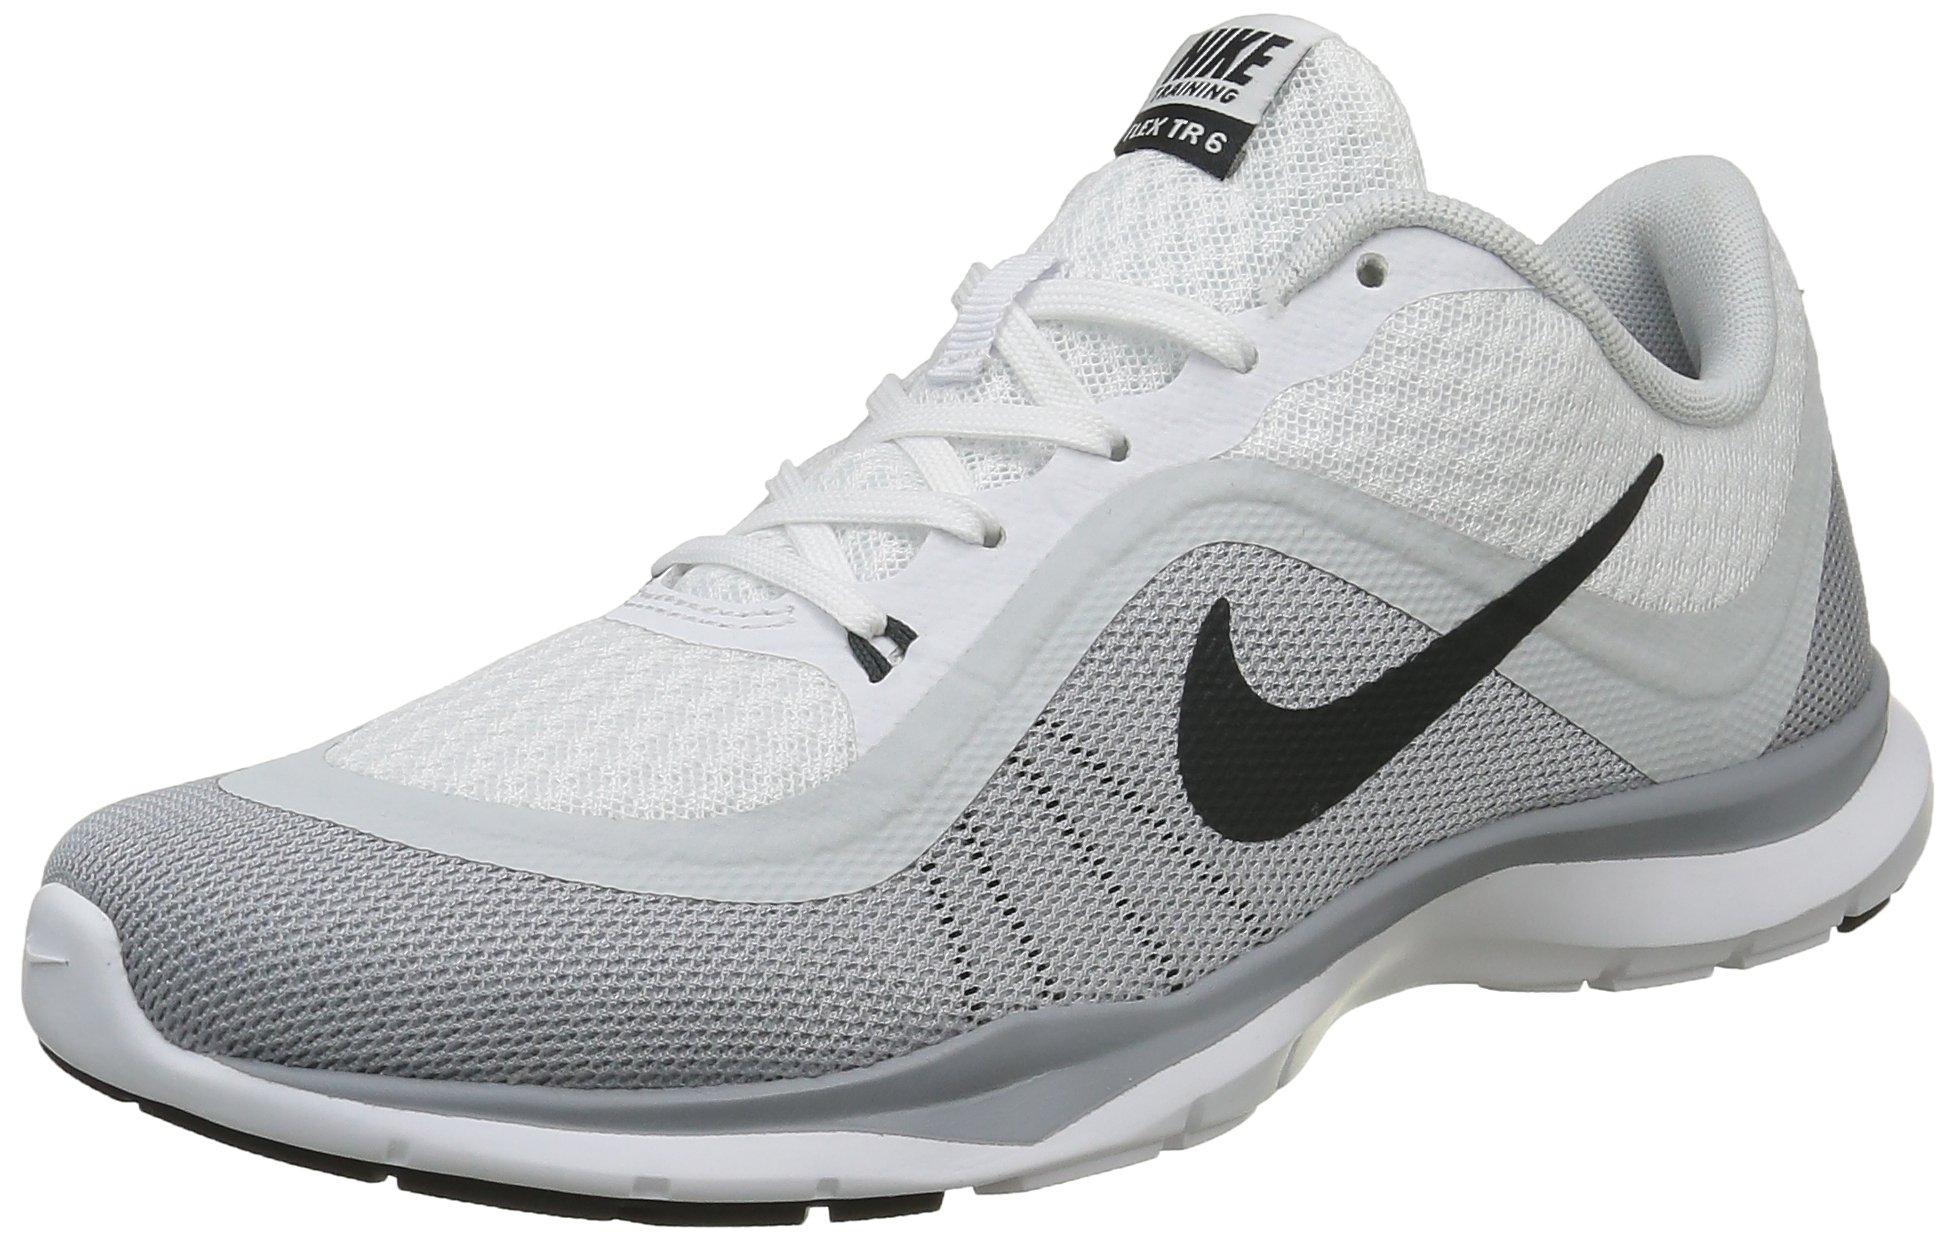 6a1f4b00b55 Galleon - Nike Women s Flex Trainer 6